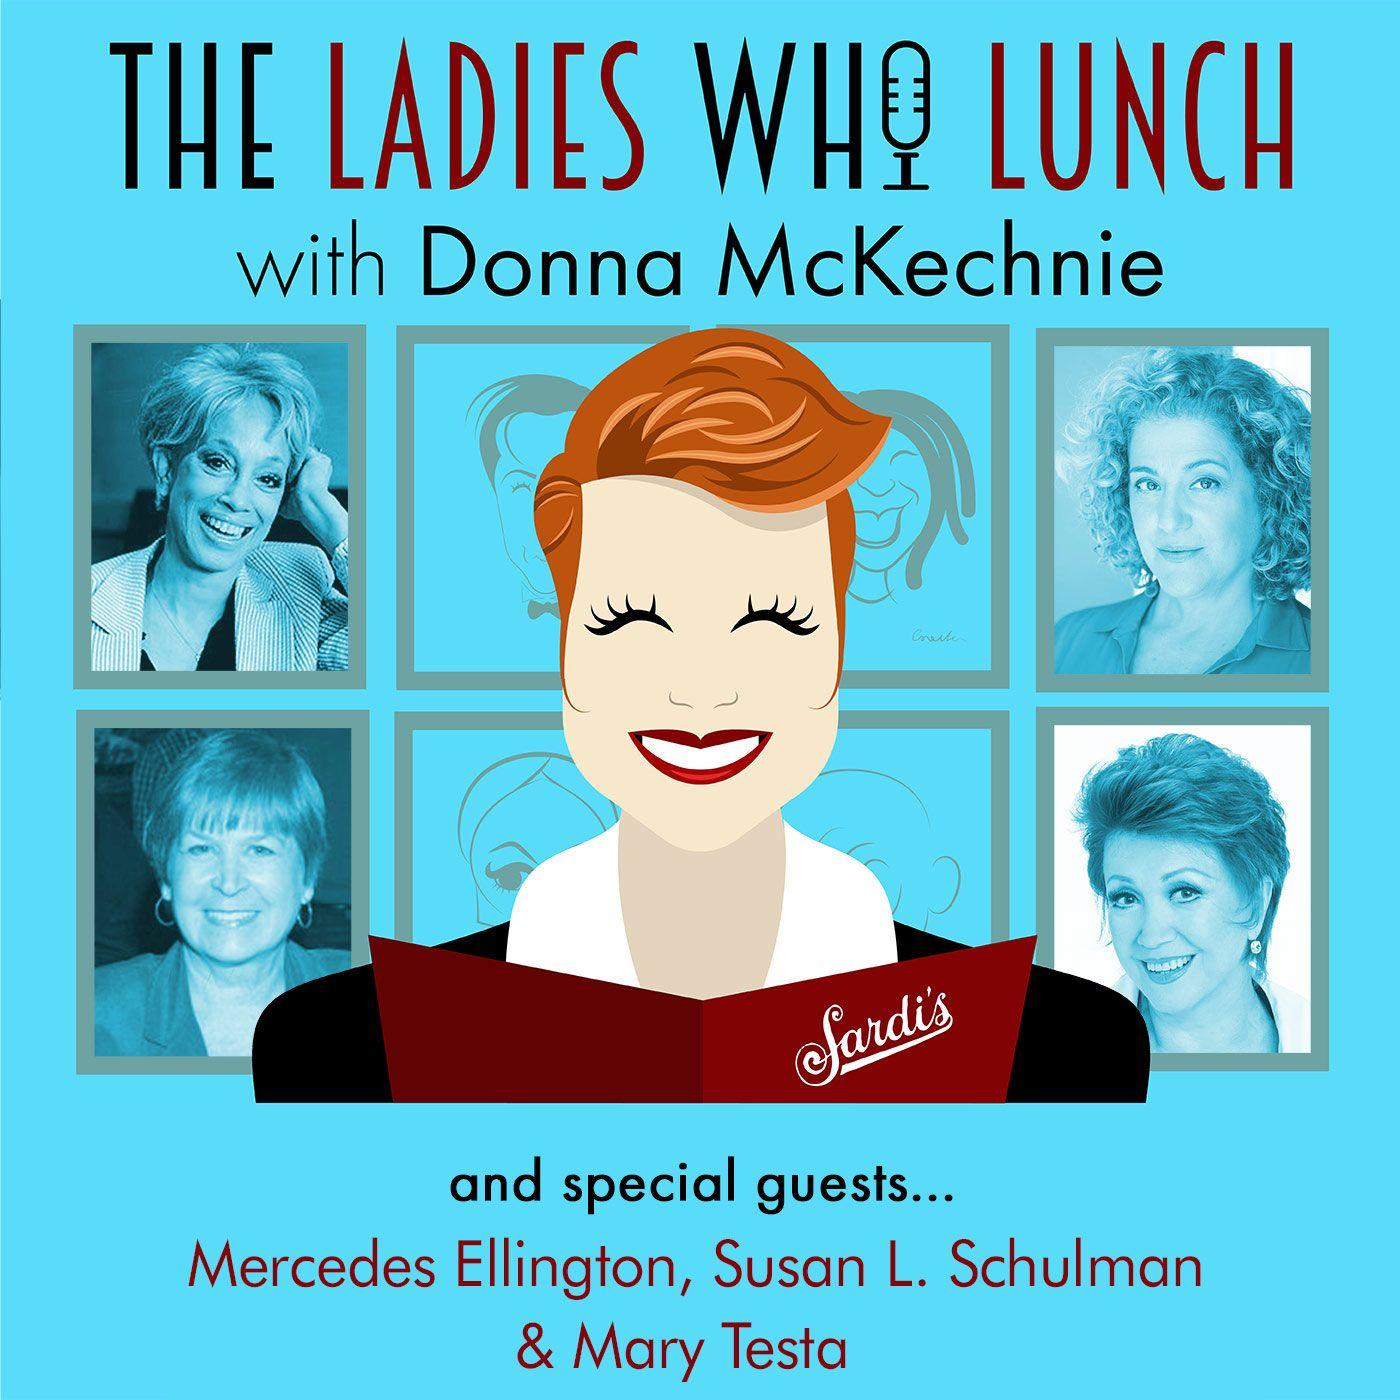 #3 - Mercedes Ellington, Susan L. Schulman & Mary Testa